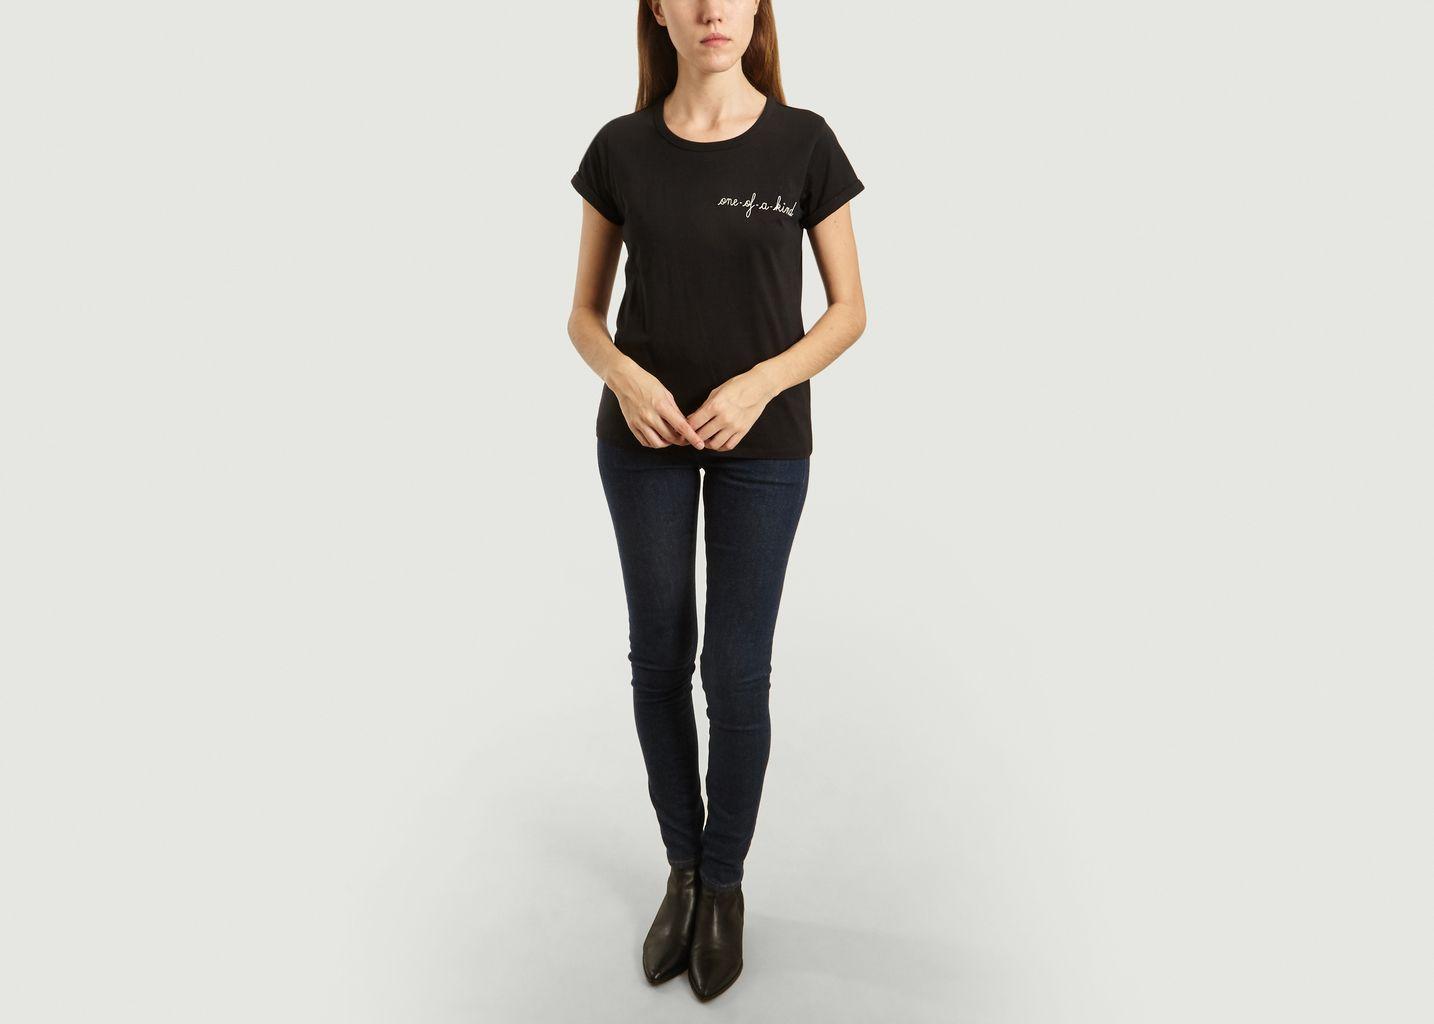 T-Shirt Brodé One Of A Kind - Maison Labiche